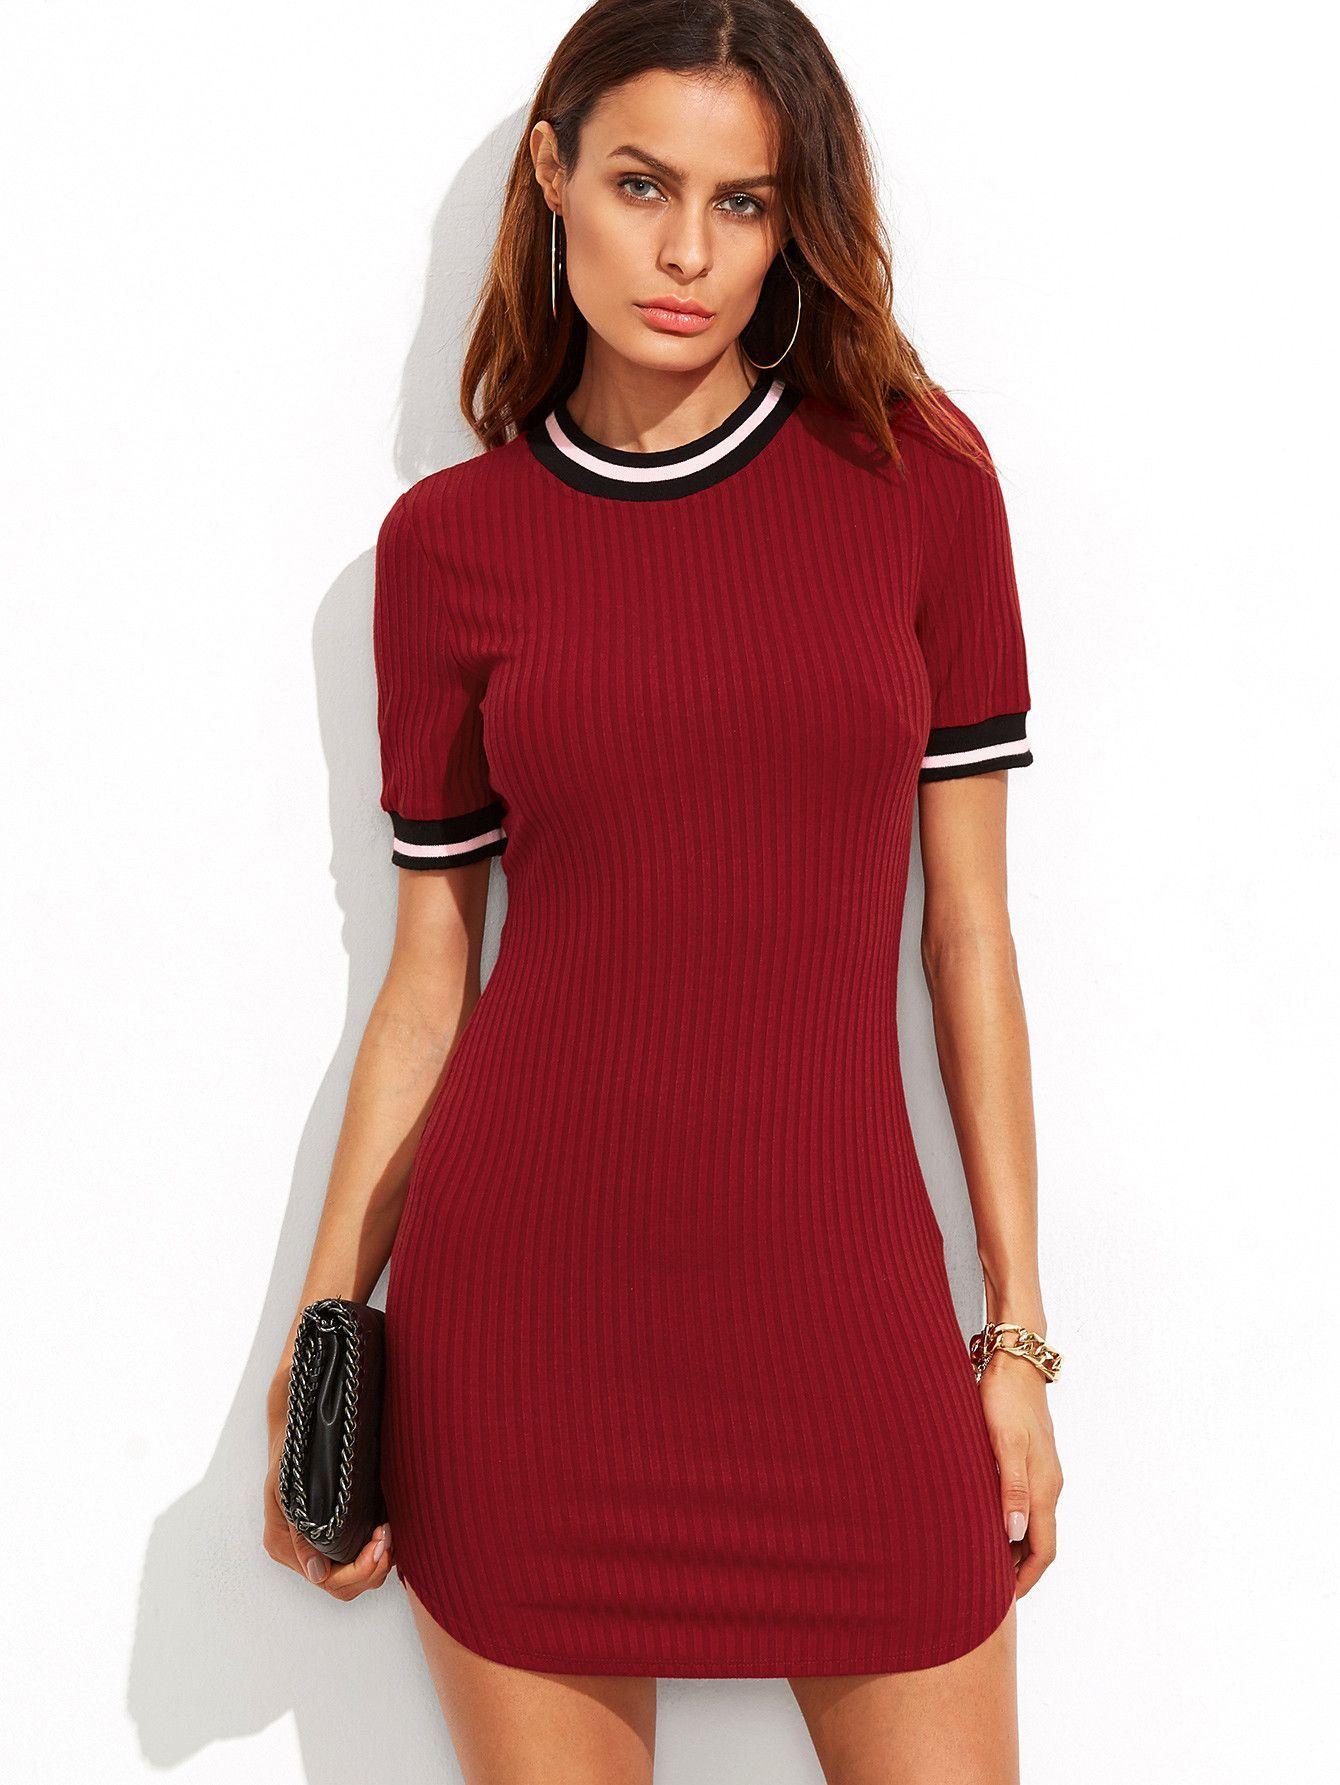 7c462e270649 Burgundy Striped Trim Ribbed Knit Bodycon Dress in 2019